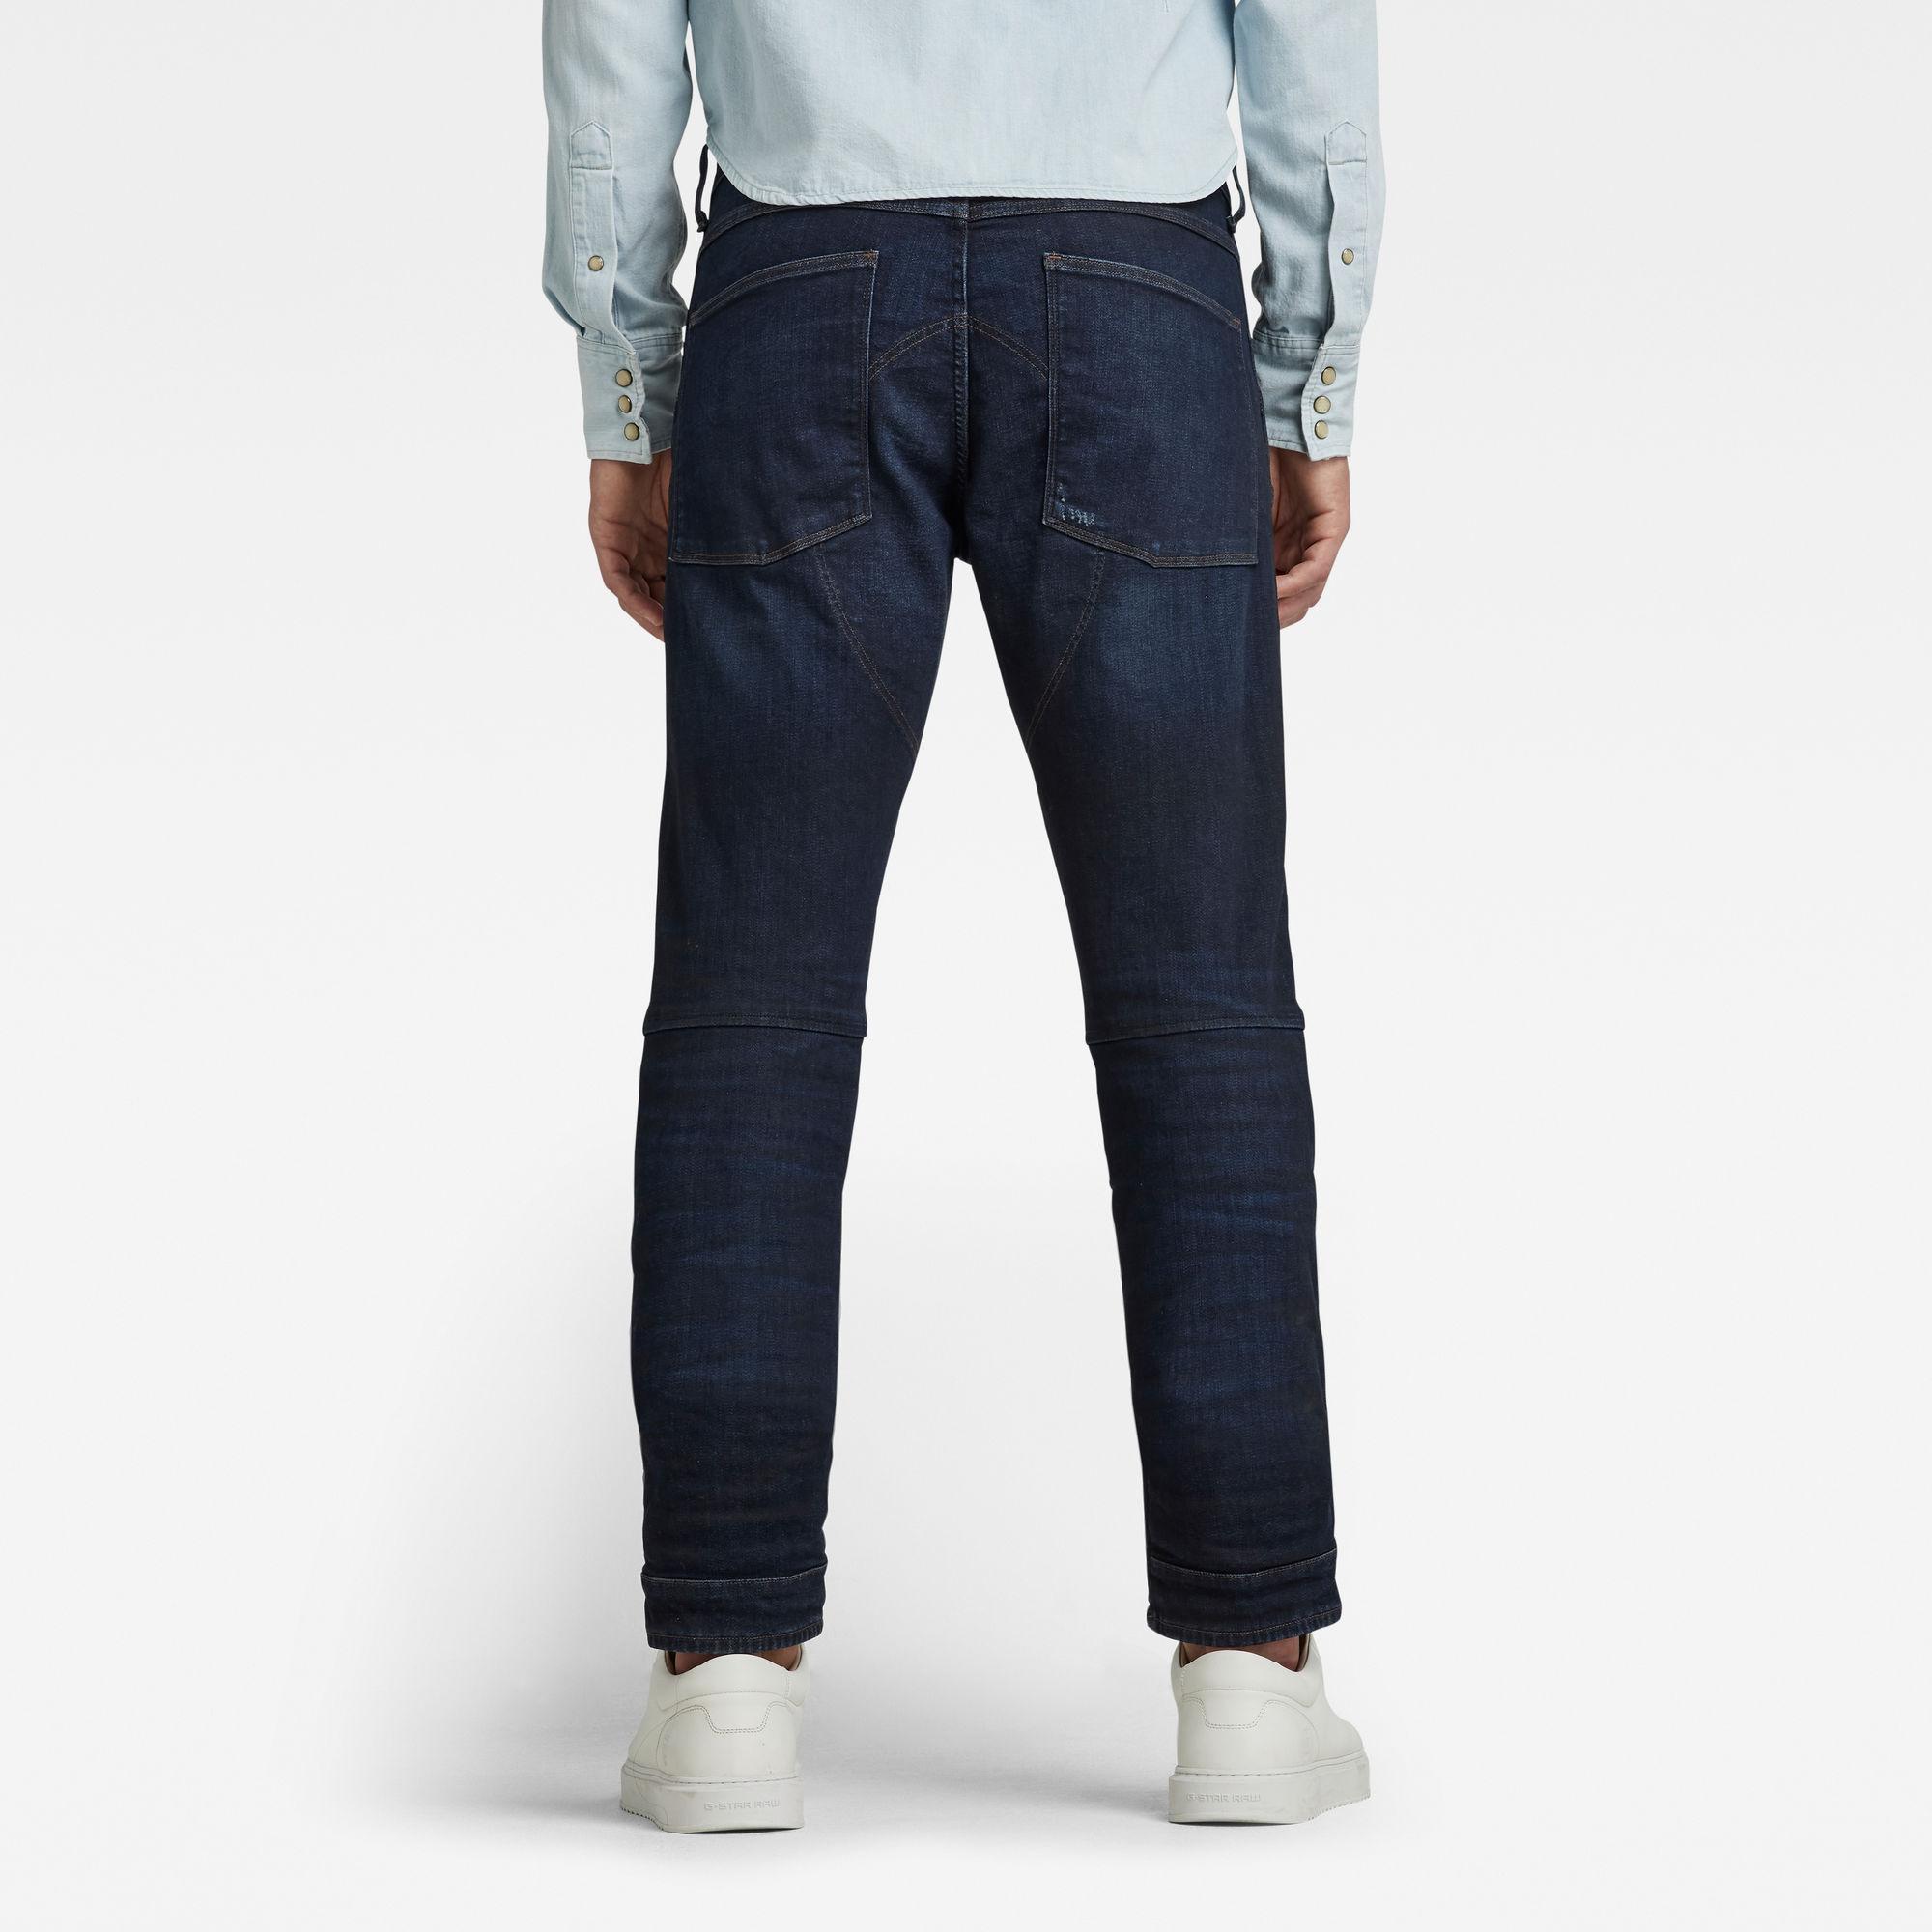 G-Star RAW 5620 3D Slim Jeans